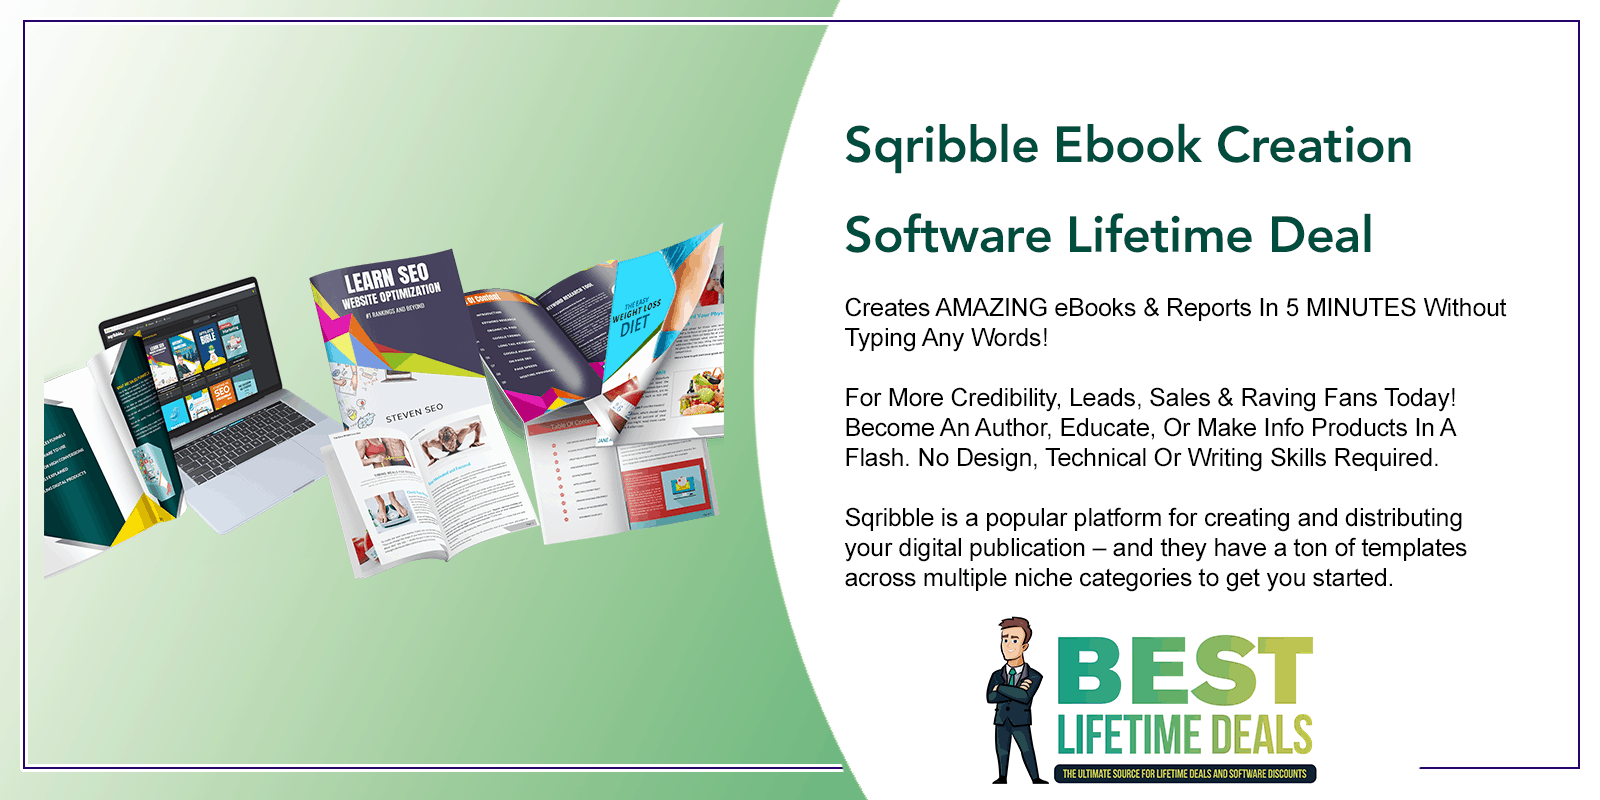 Sqribble Ebook Creation Software Lifetime Deal Post Image